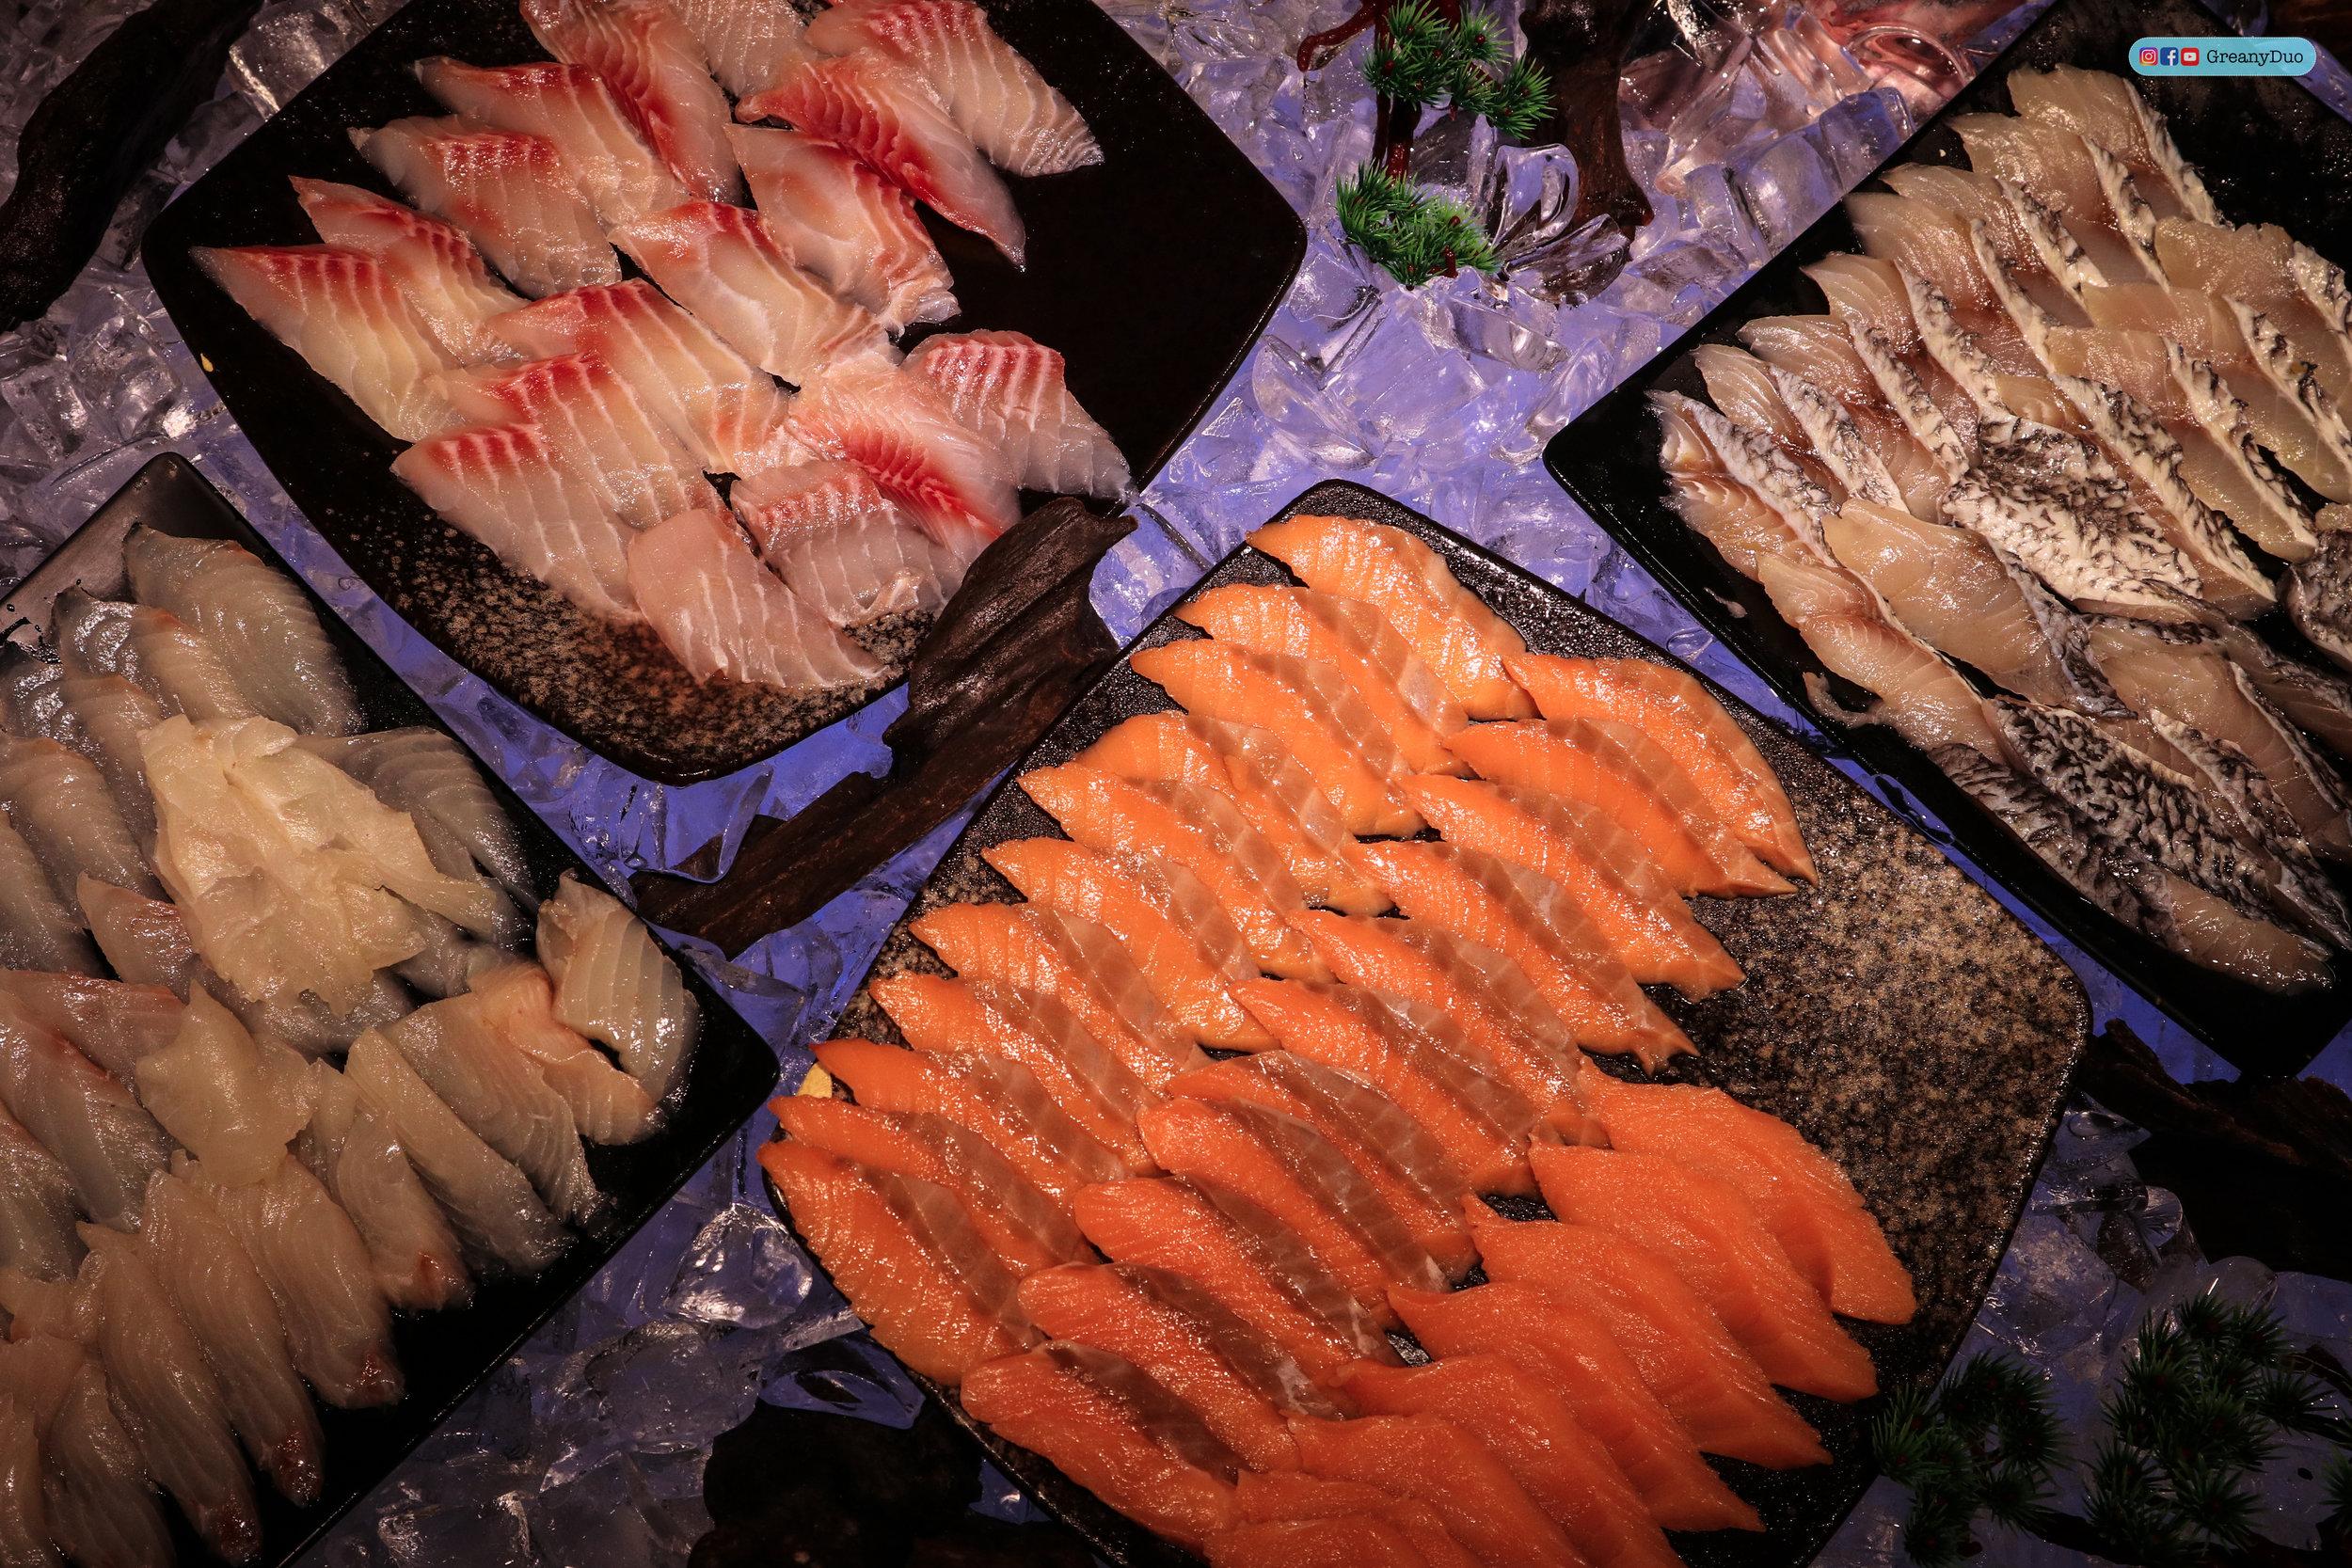 fresh fish at บุฟเฟ่ต์ชาบูไต้หวันที่ Hakkai Shabu Shabu ซีเหมินติง